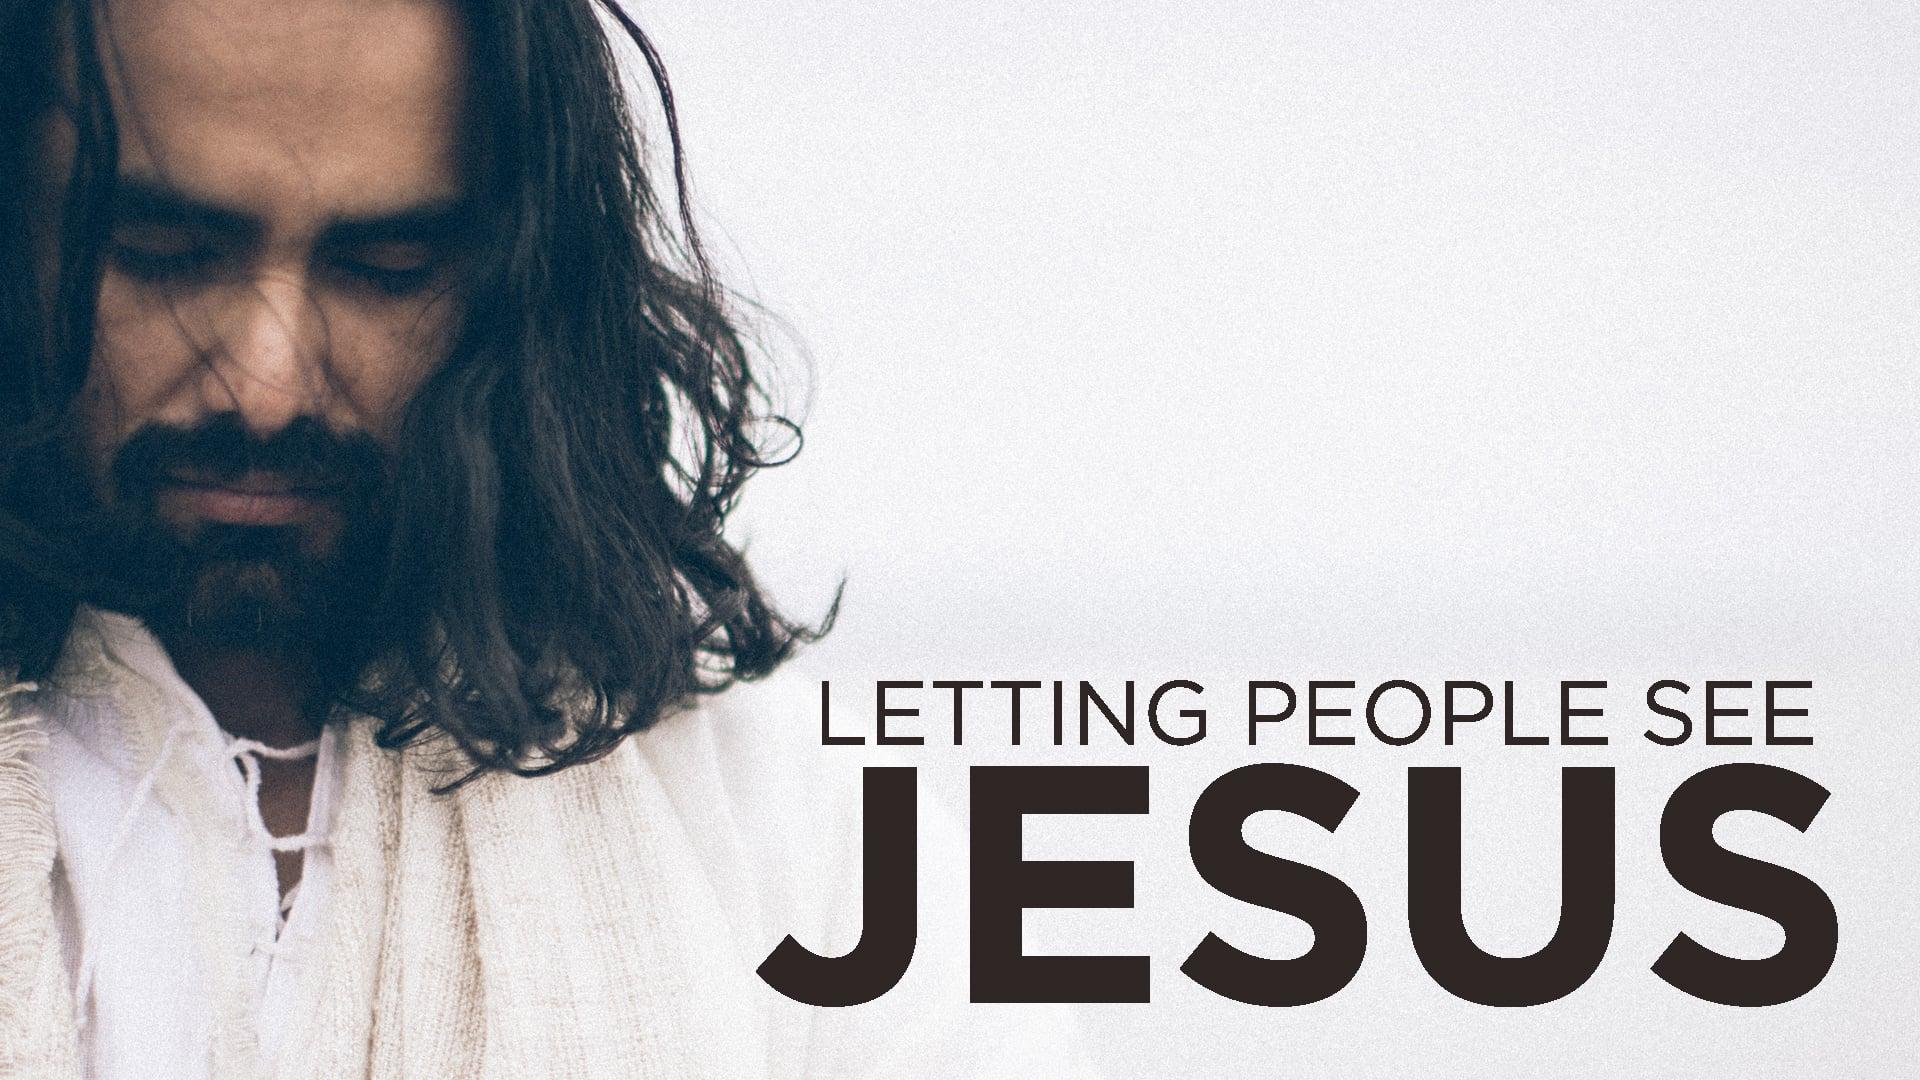 Jesus - the Image of God